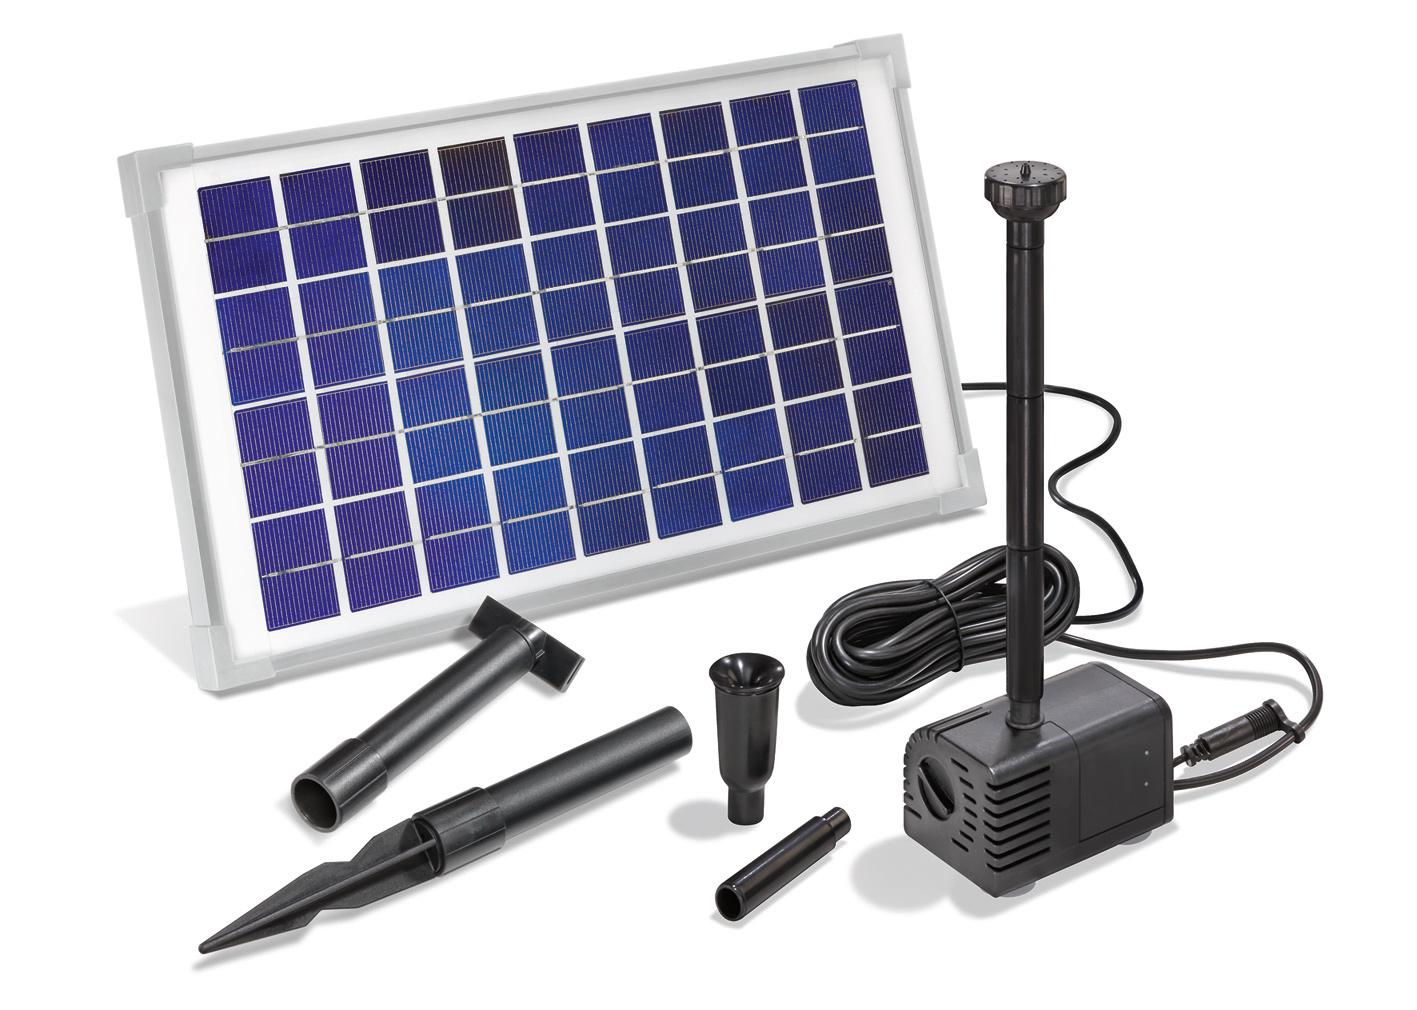 Solar Teichfilter Set 5//470 Solarpumpe Gartenteich Pumpenset Teich esotec 101065